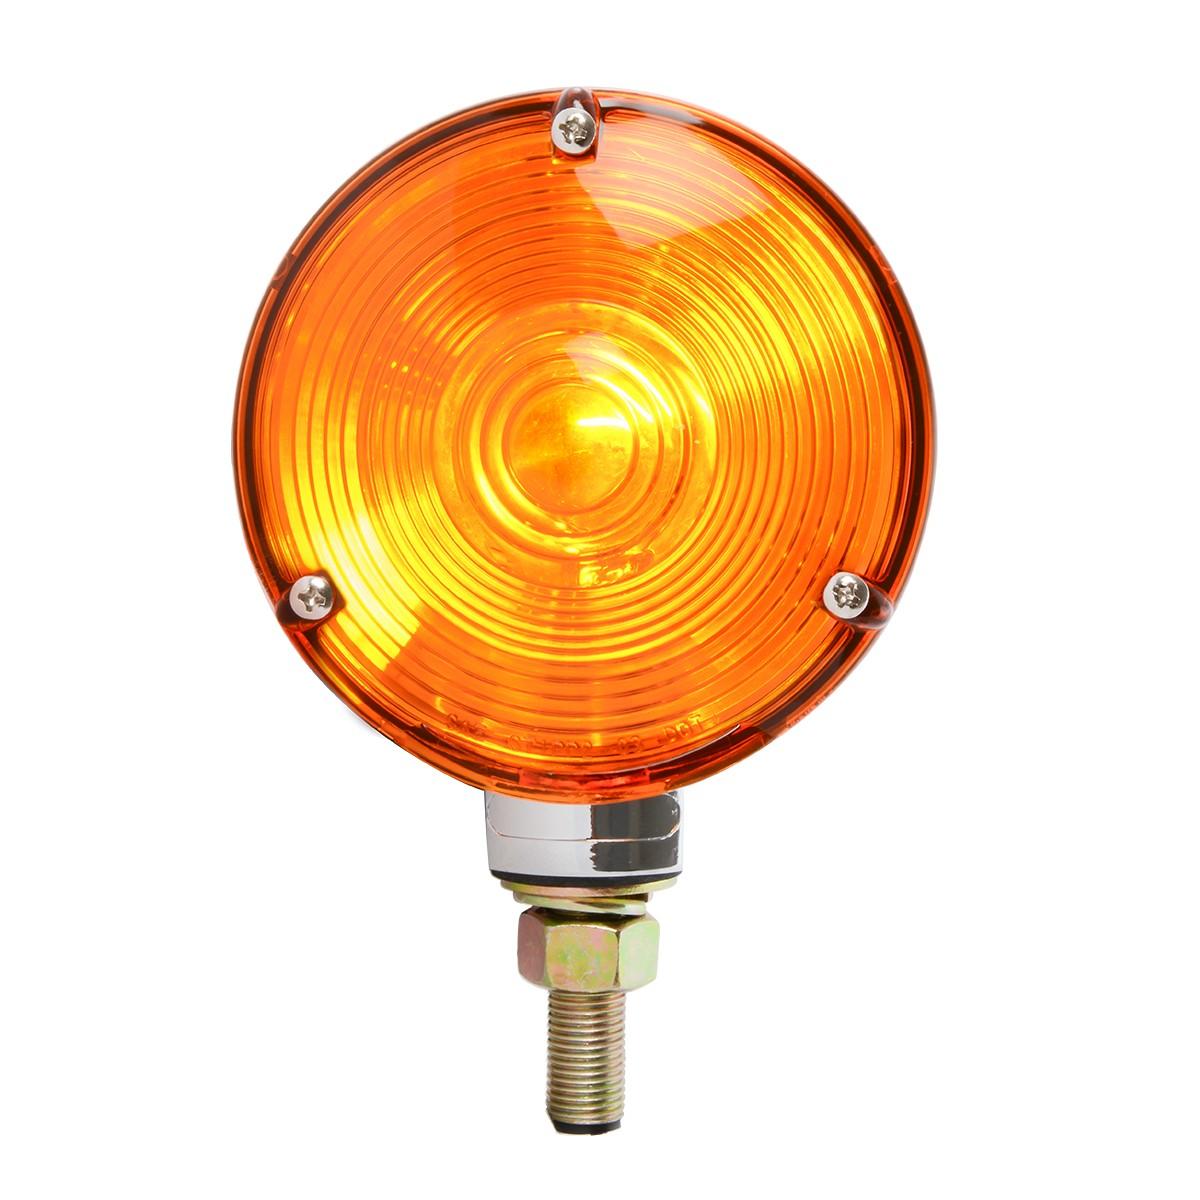 "#80501 4"" Single Face Pedestal Amber Light"